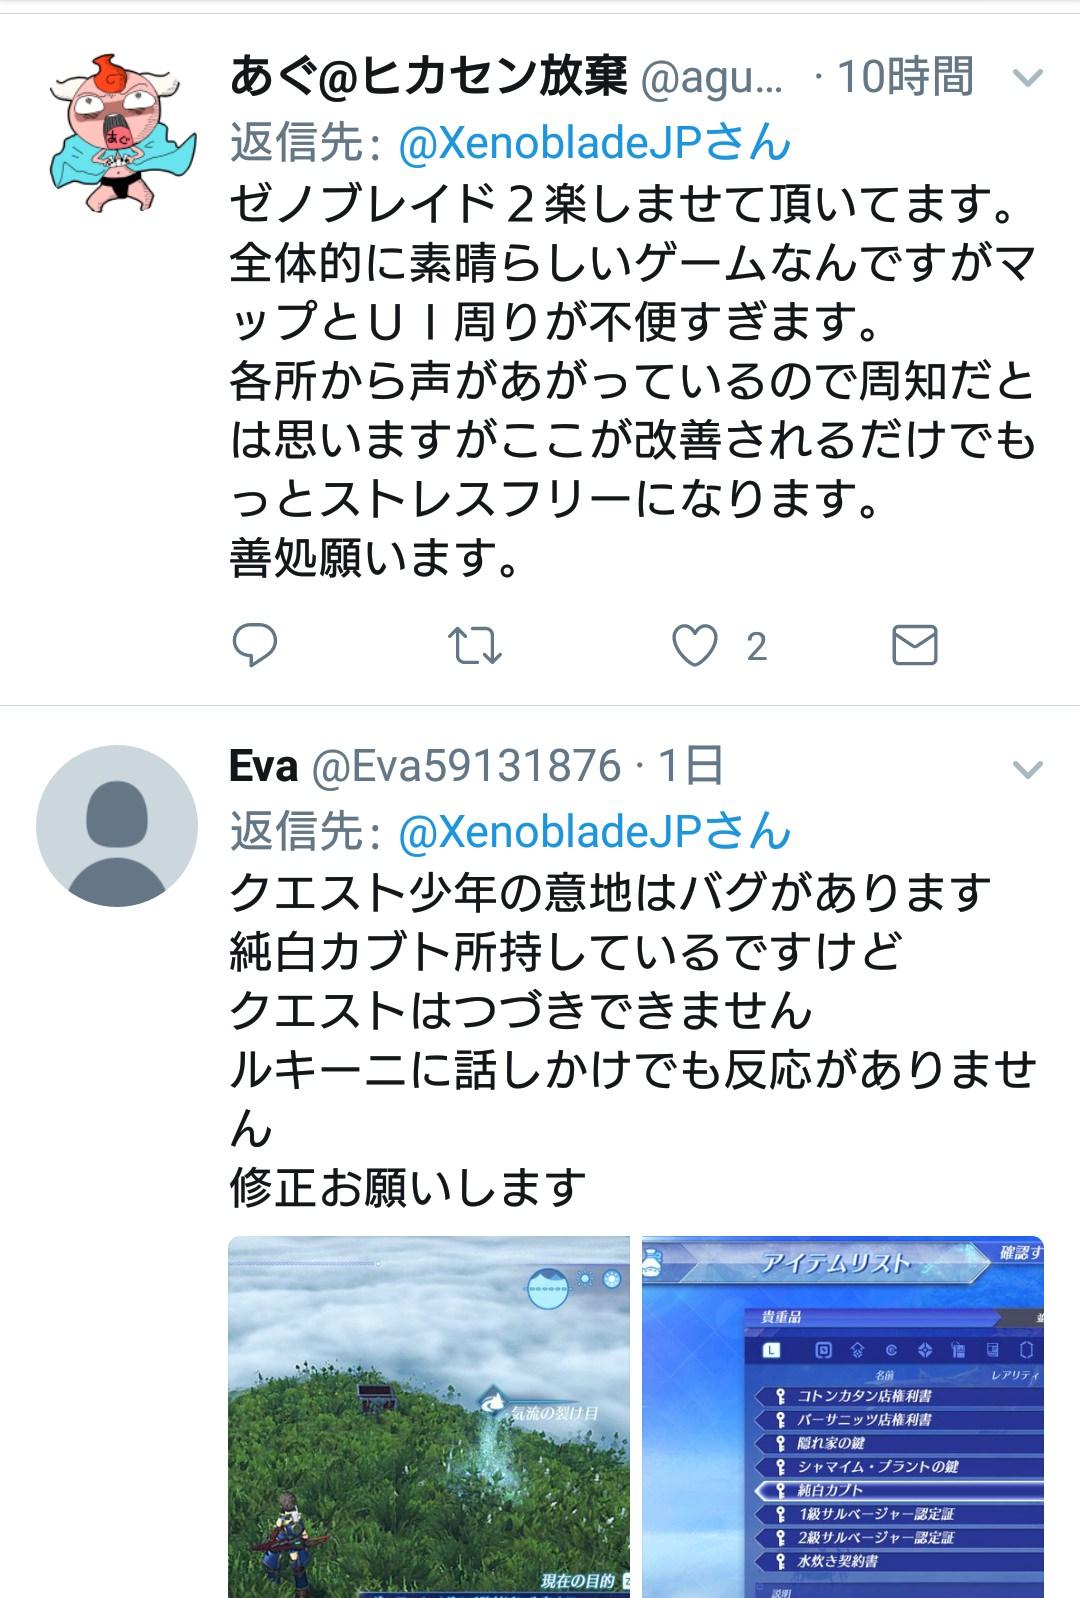 56cpq5nGdl9vr - 【悲報】ゼノブレイド2  ゲーム内に複雑な戦闘の説明がないためtwitterで説明し始める